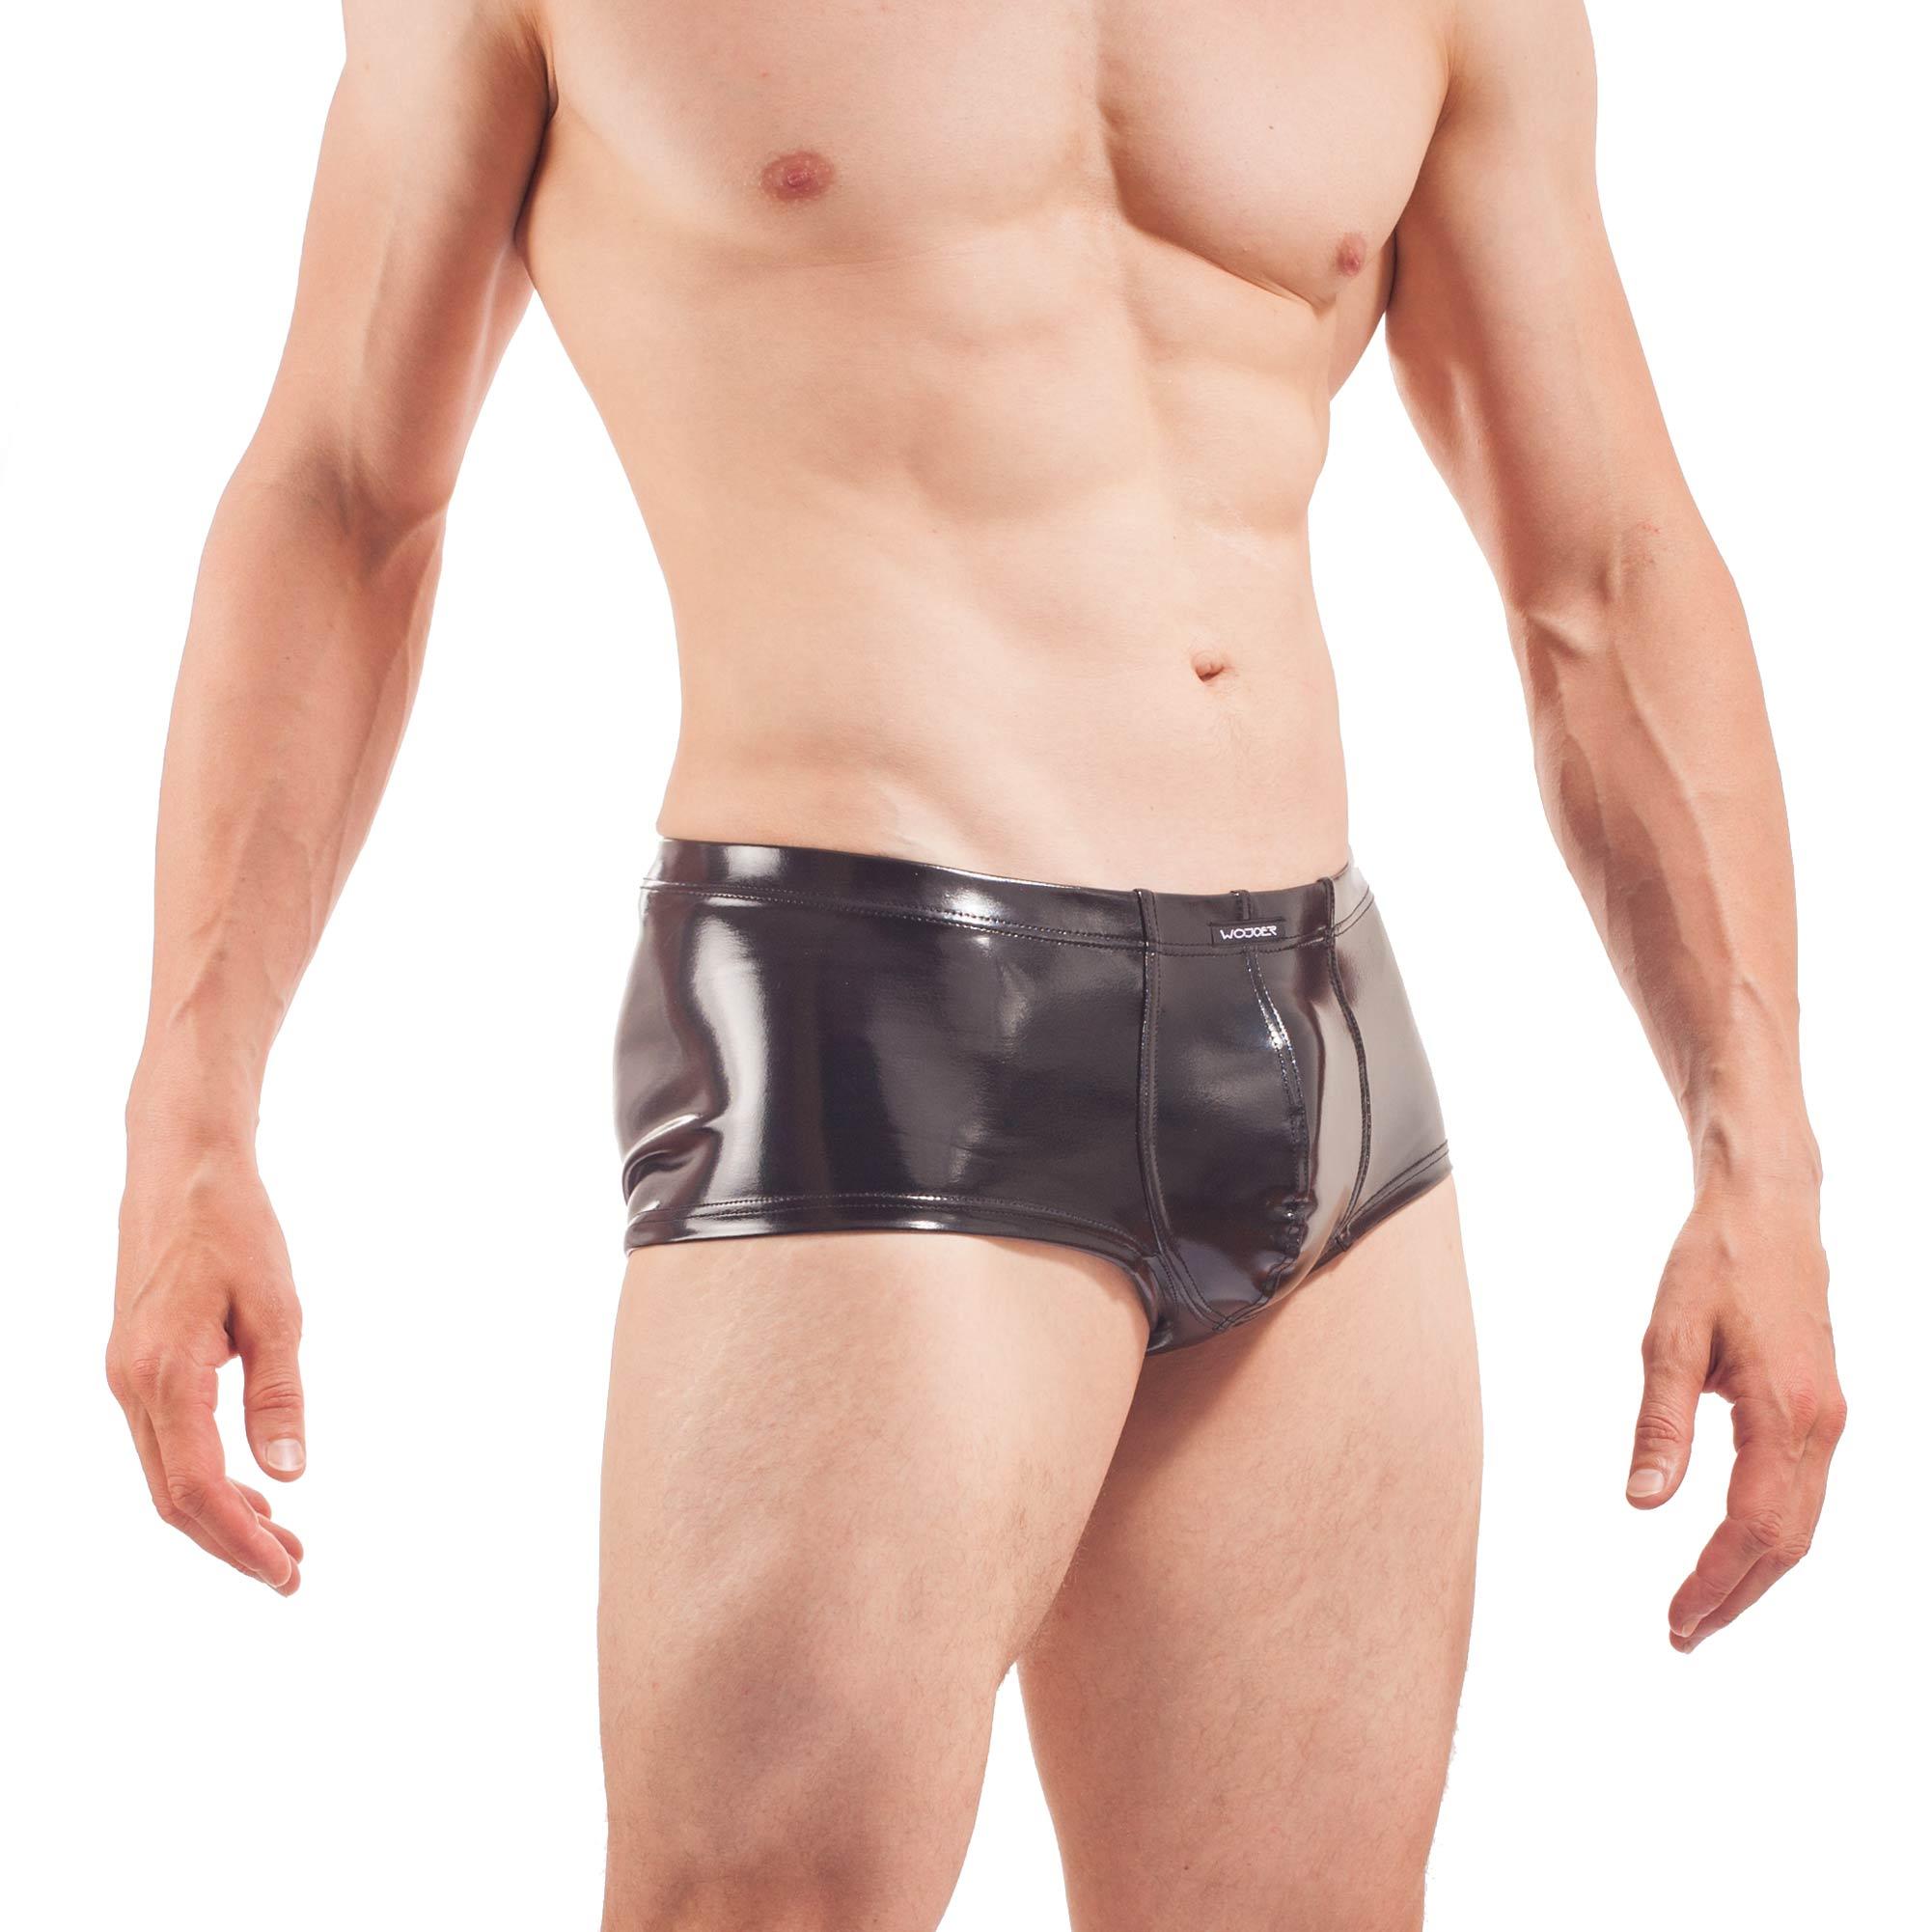 glossy wet leather Pants, Hipster in wetleather, Lack Glanz, Gummihose, Rubber Shorts, schwarzer Glanz, Fetisch